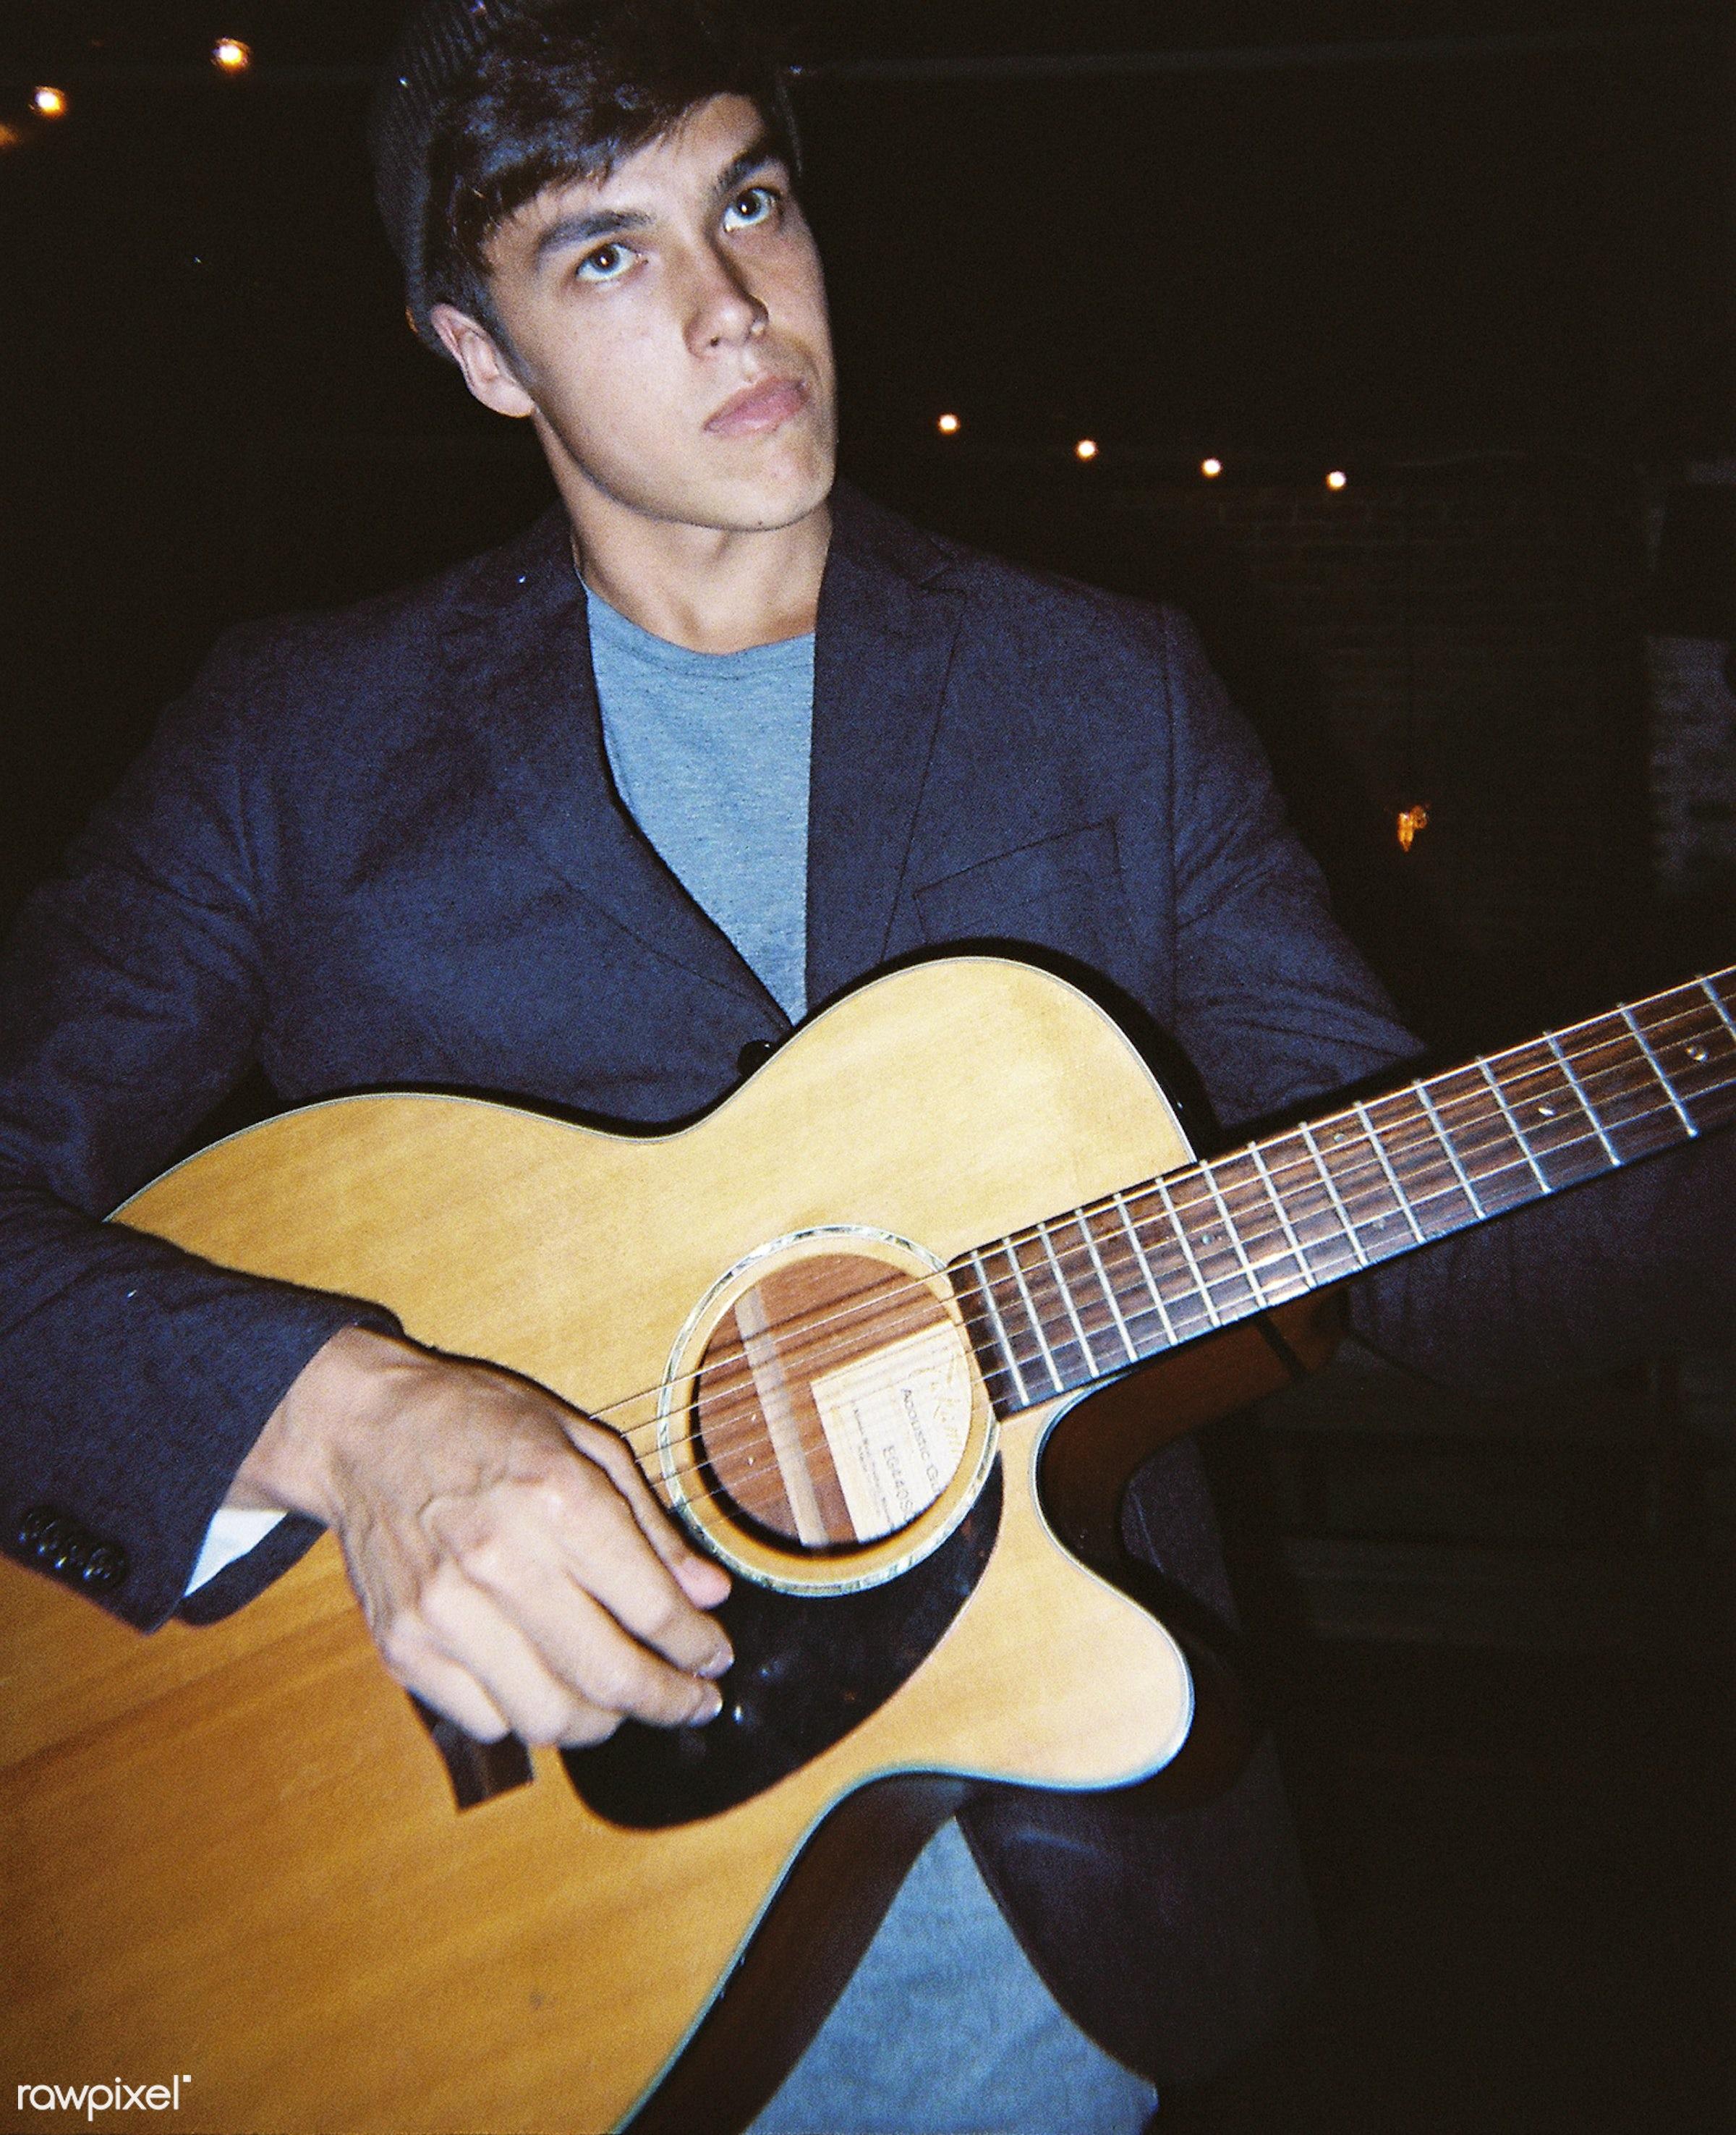 A man playing guitar - 2018, alone, band, birthday, birthday party, caucasian, celebrate, celebration, entertainment, fun,...